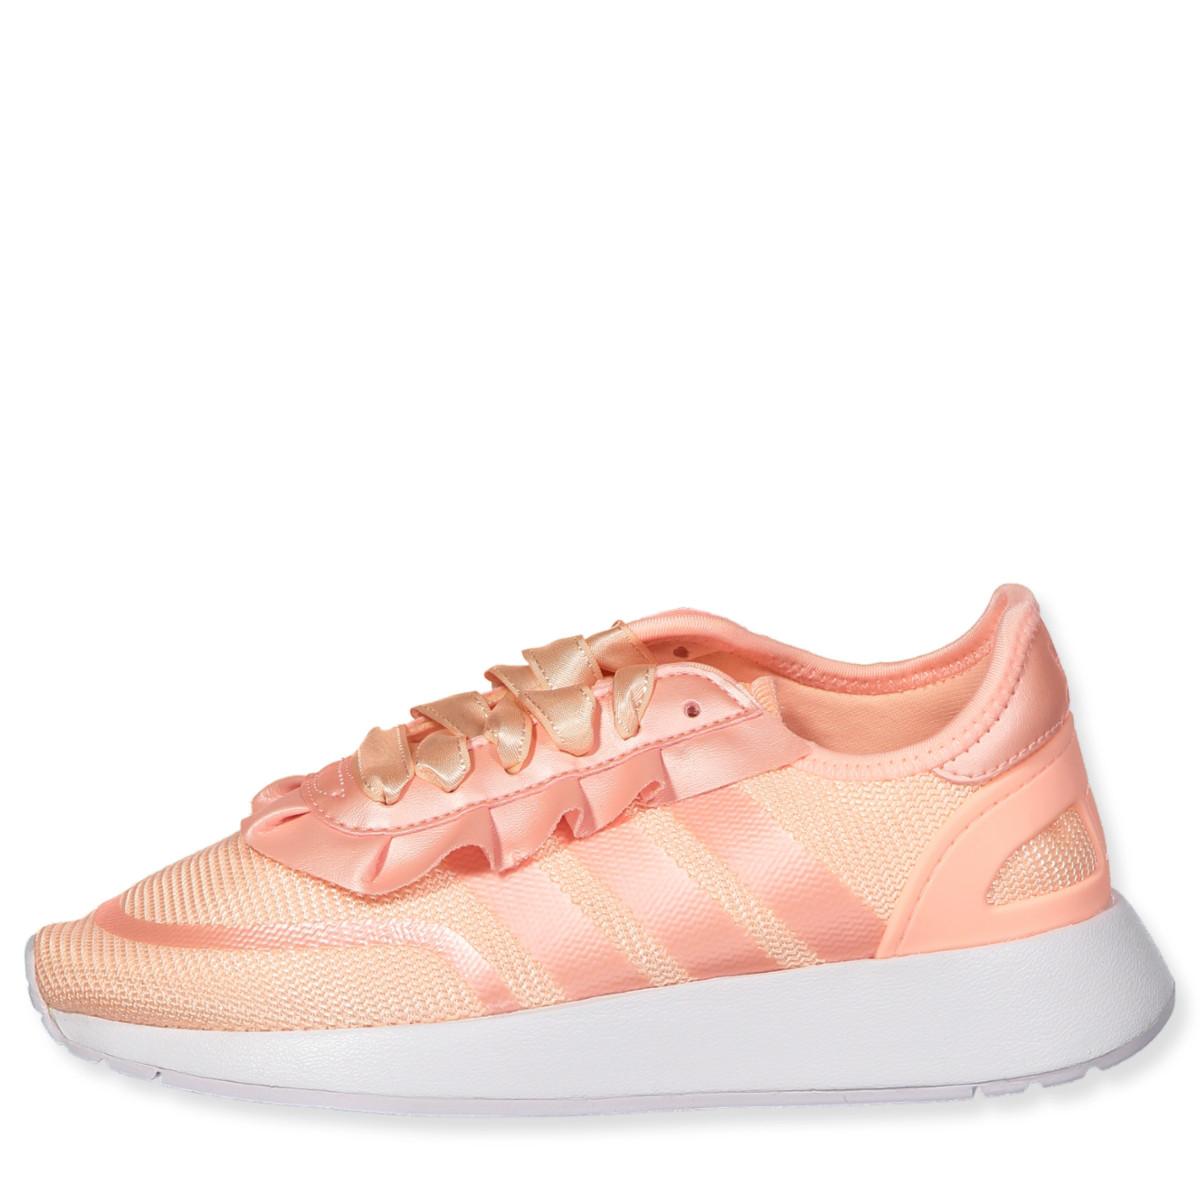 Adidas Originals - N-5923 J sneakers